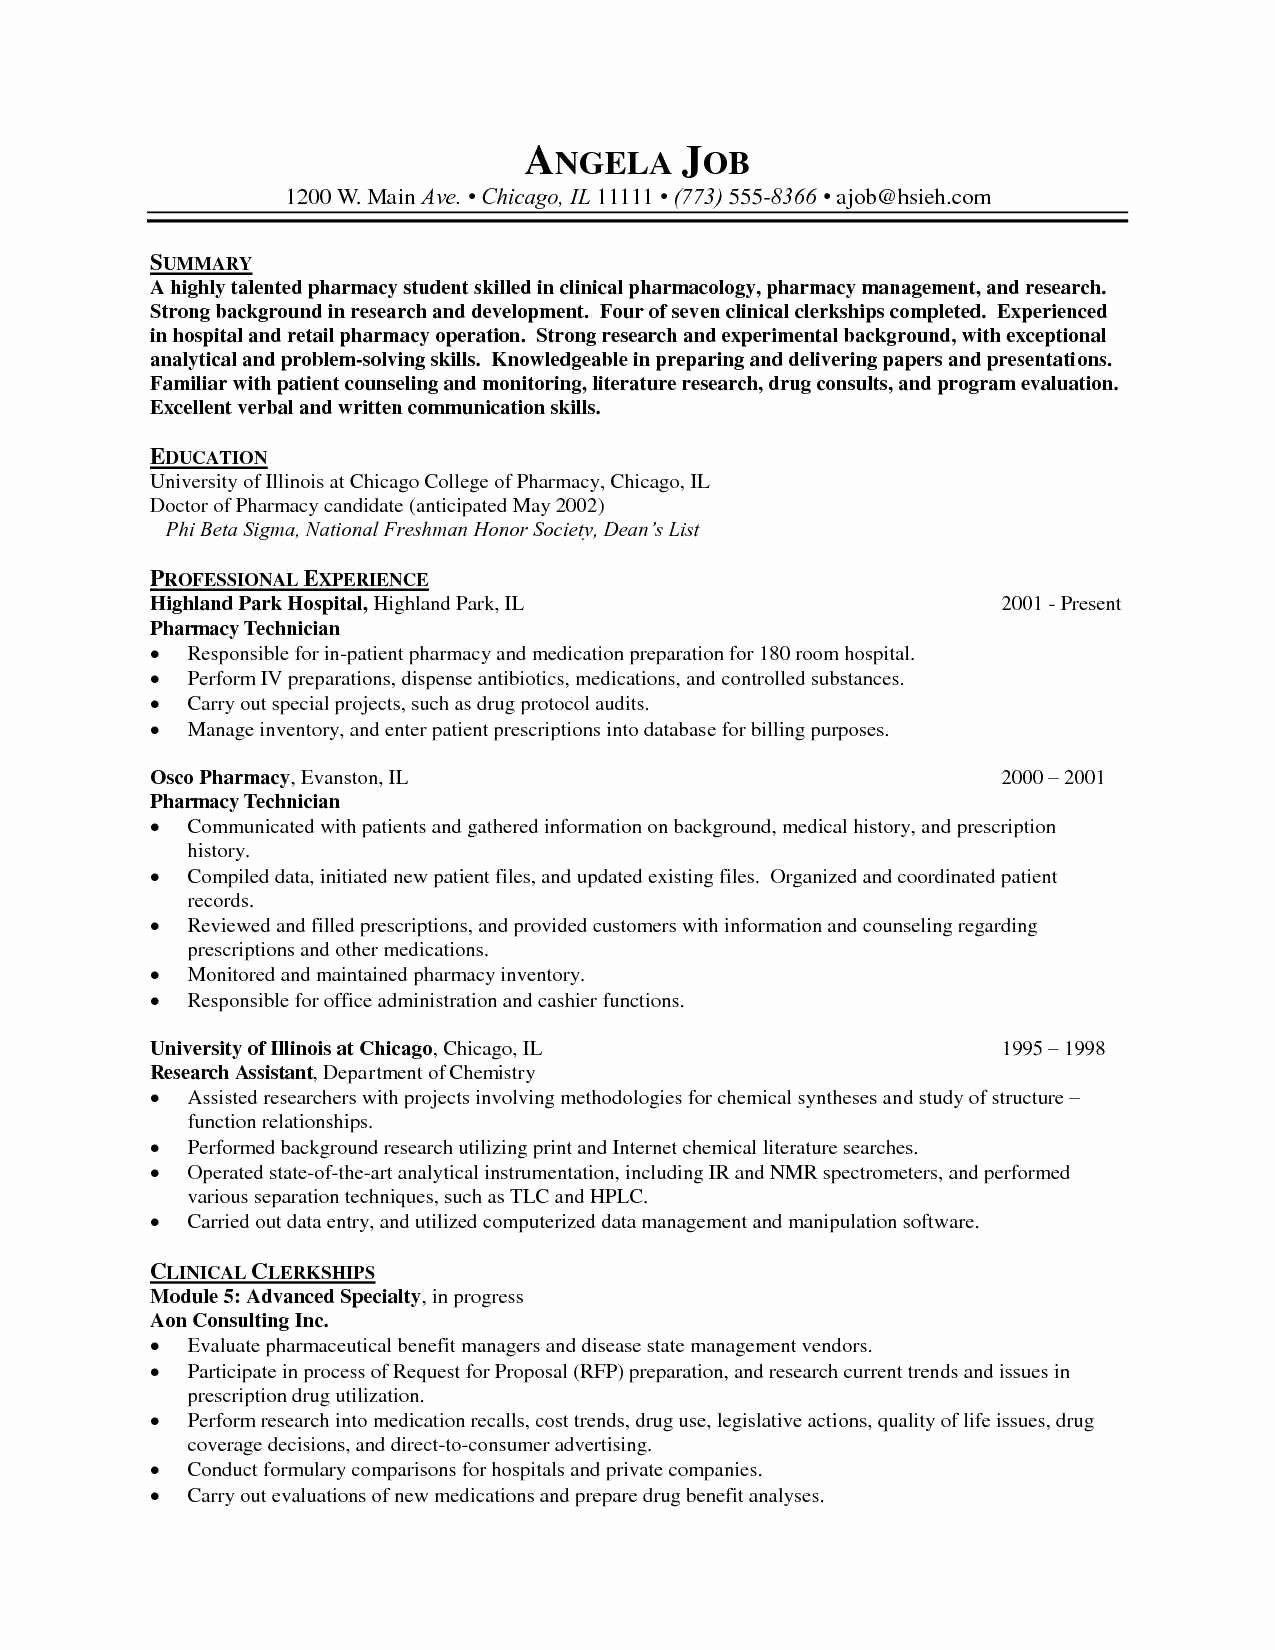 Lovely Entry Level Automotive Technician Resume Inspirational Pharmacy Technician Resume Skills Cover Letter For Resume